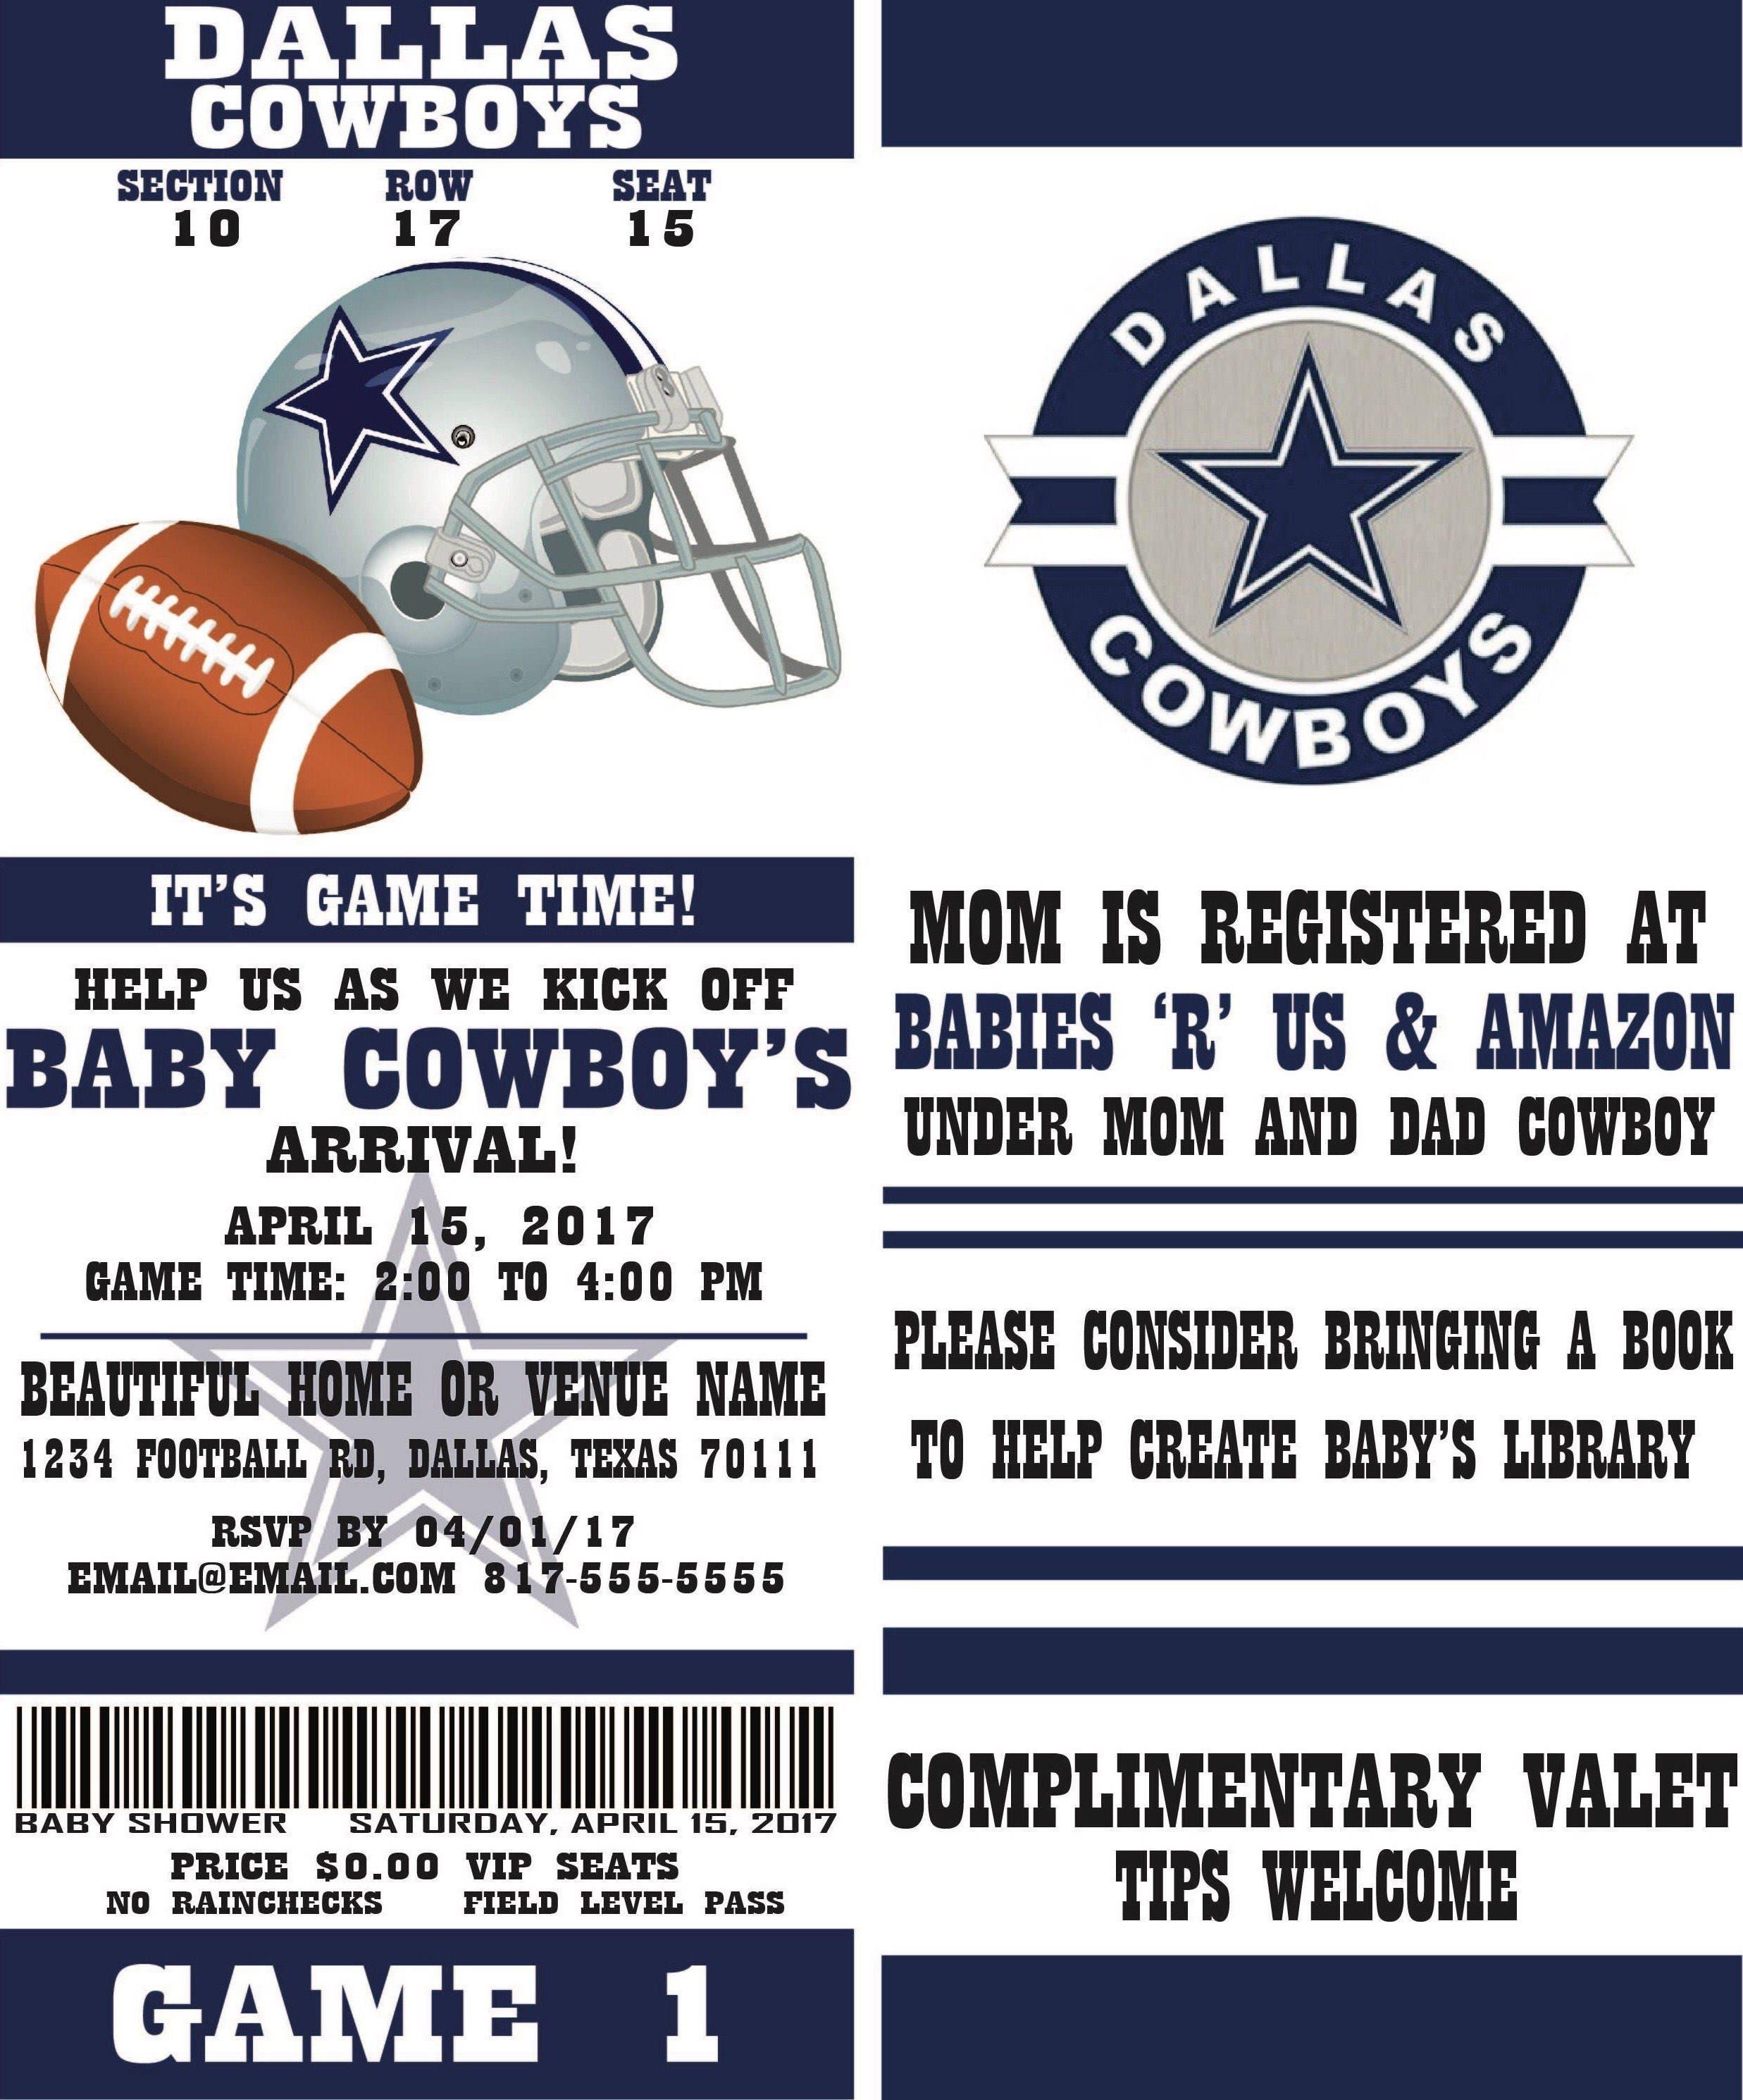 Football Ticket Party Invitation Dallas Cowboys Inspired | Etsy